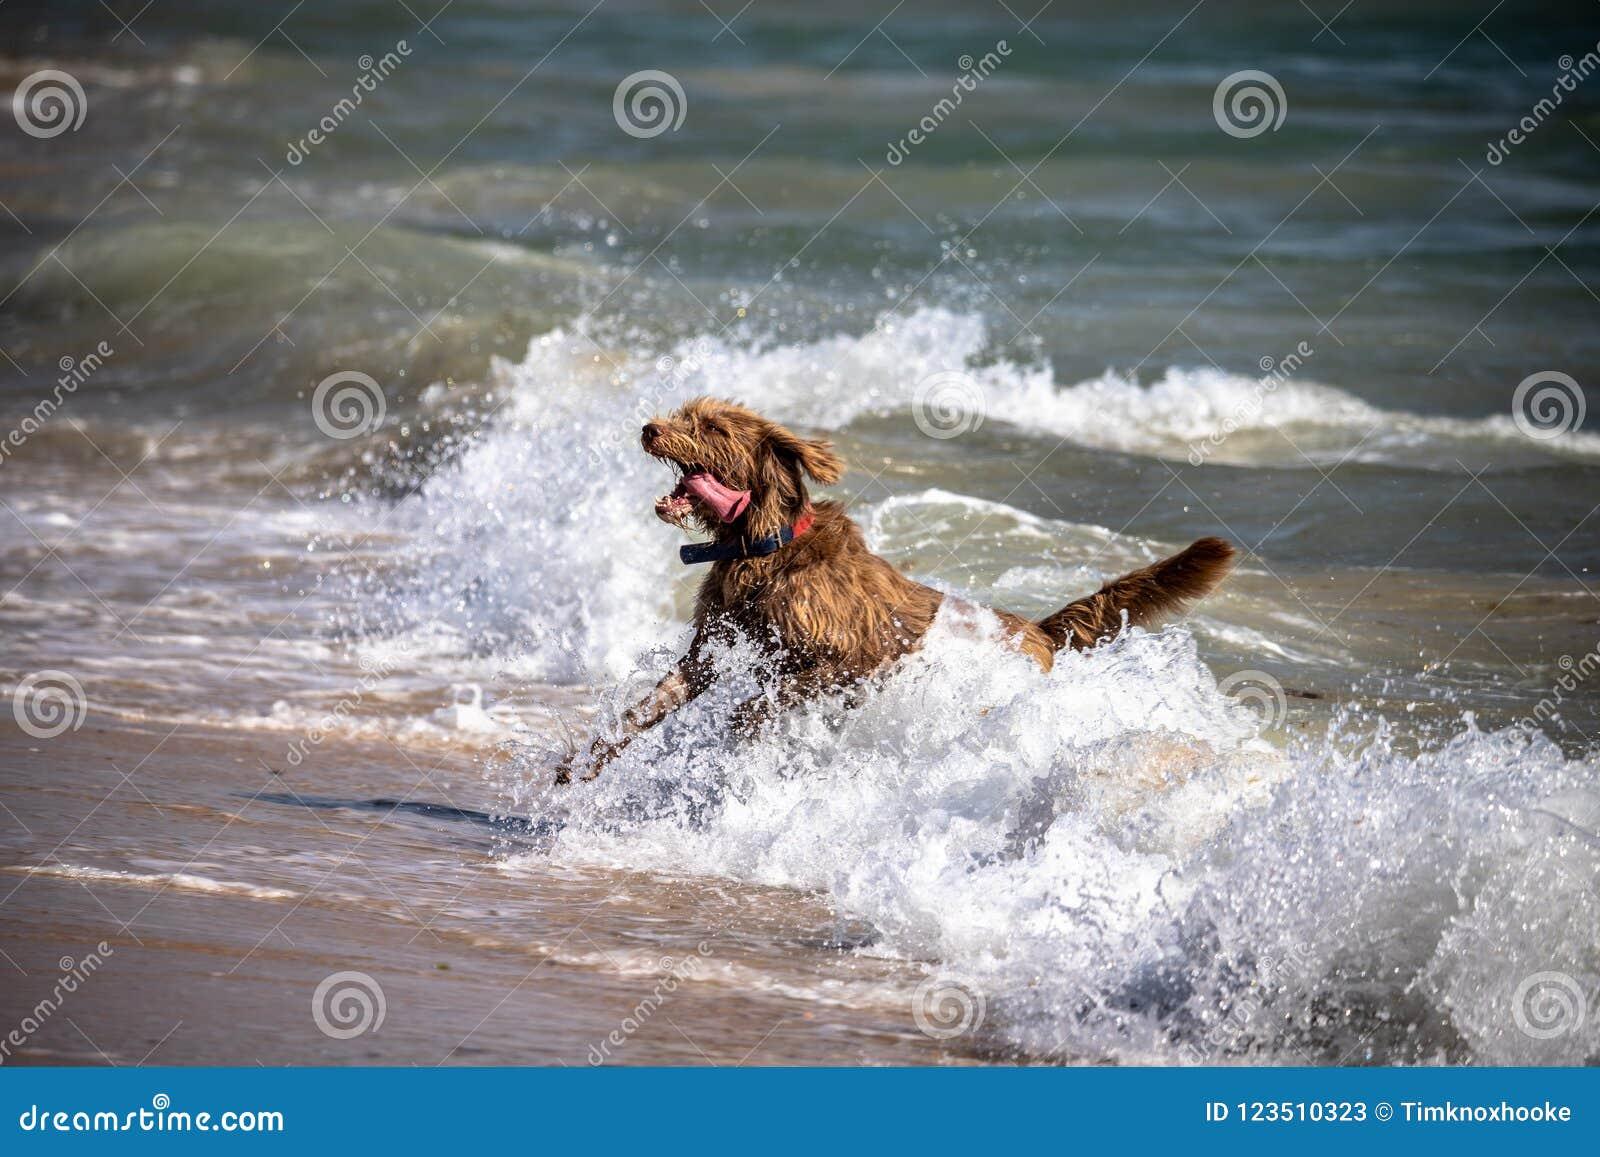 A dog in the sea in Tarifa Spain.